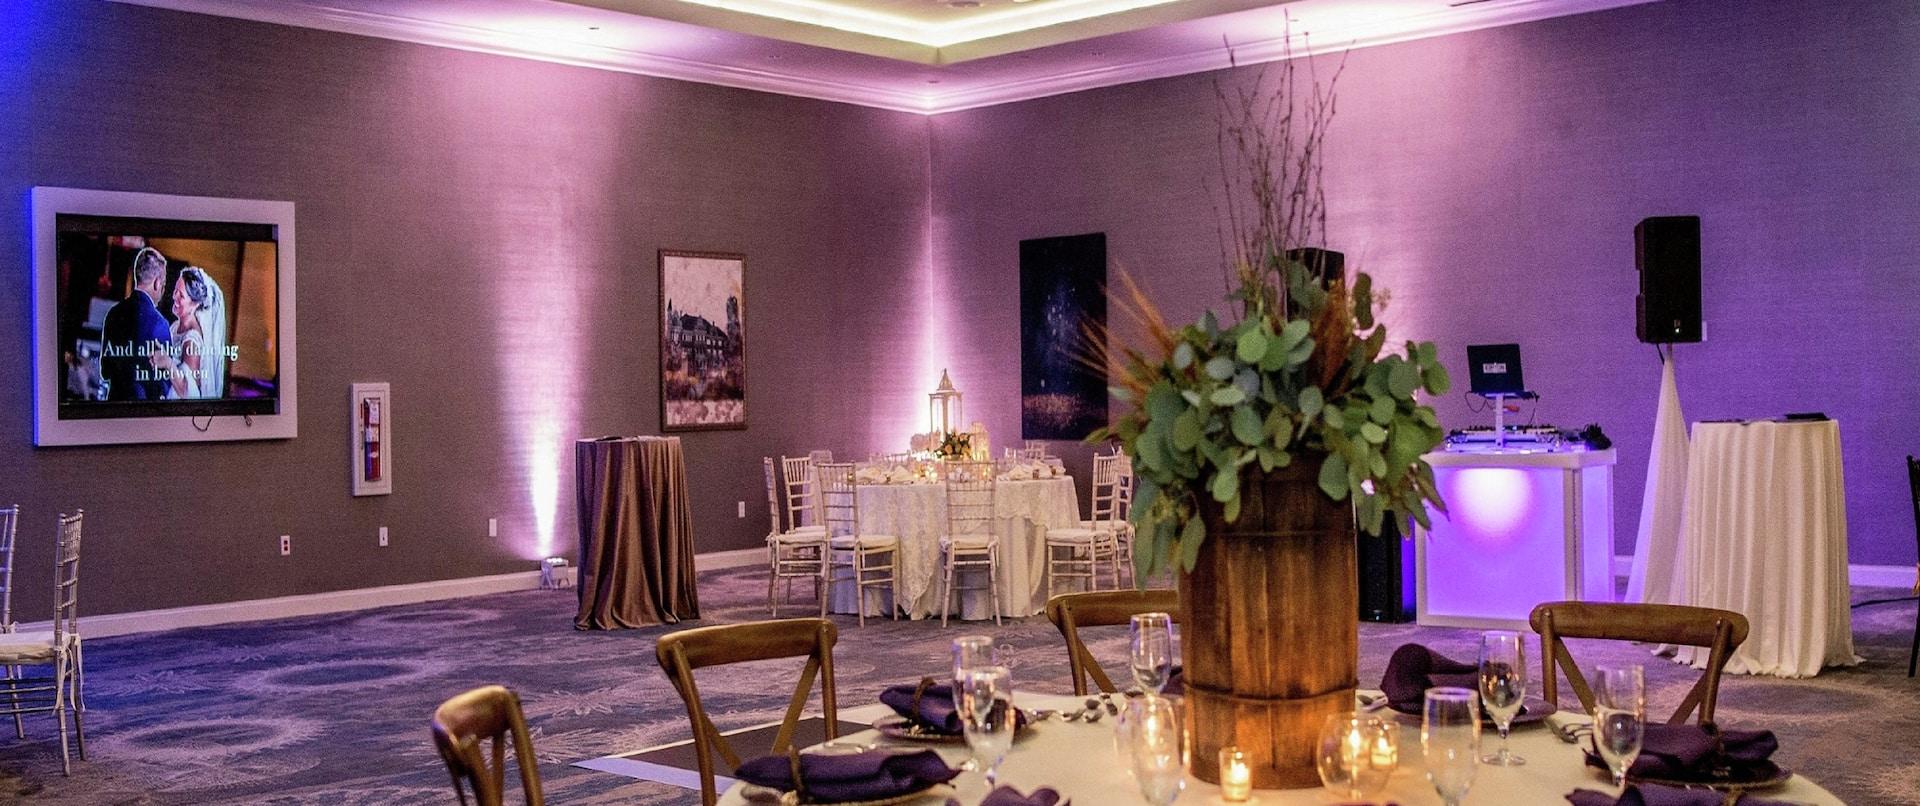 Electric City Ballroom setup for a banquet